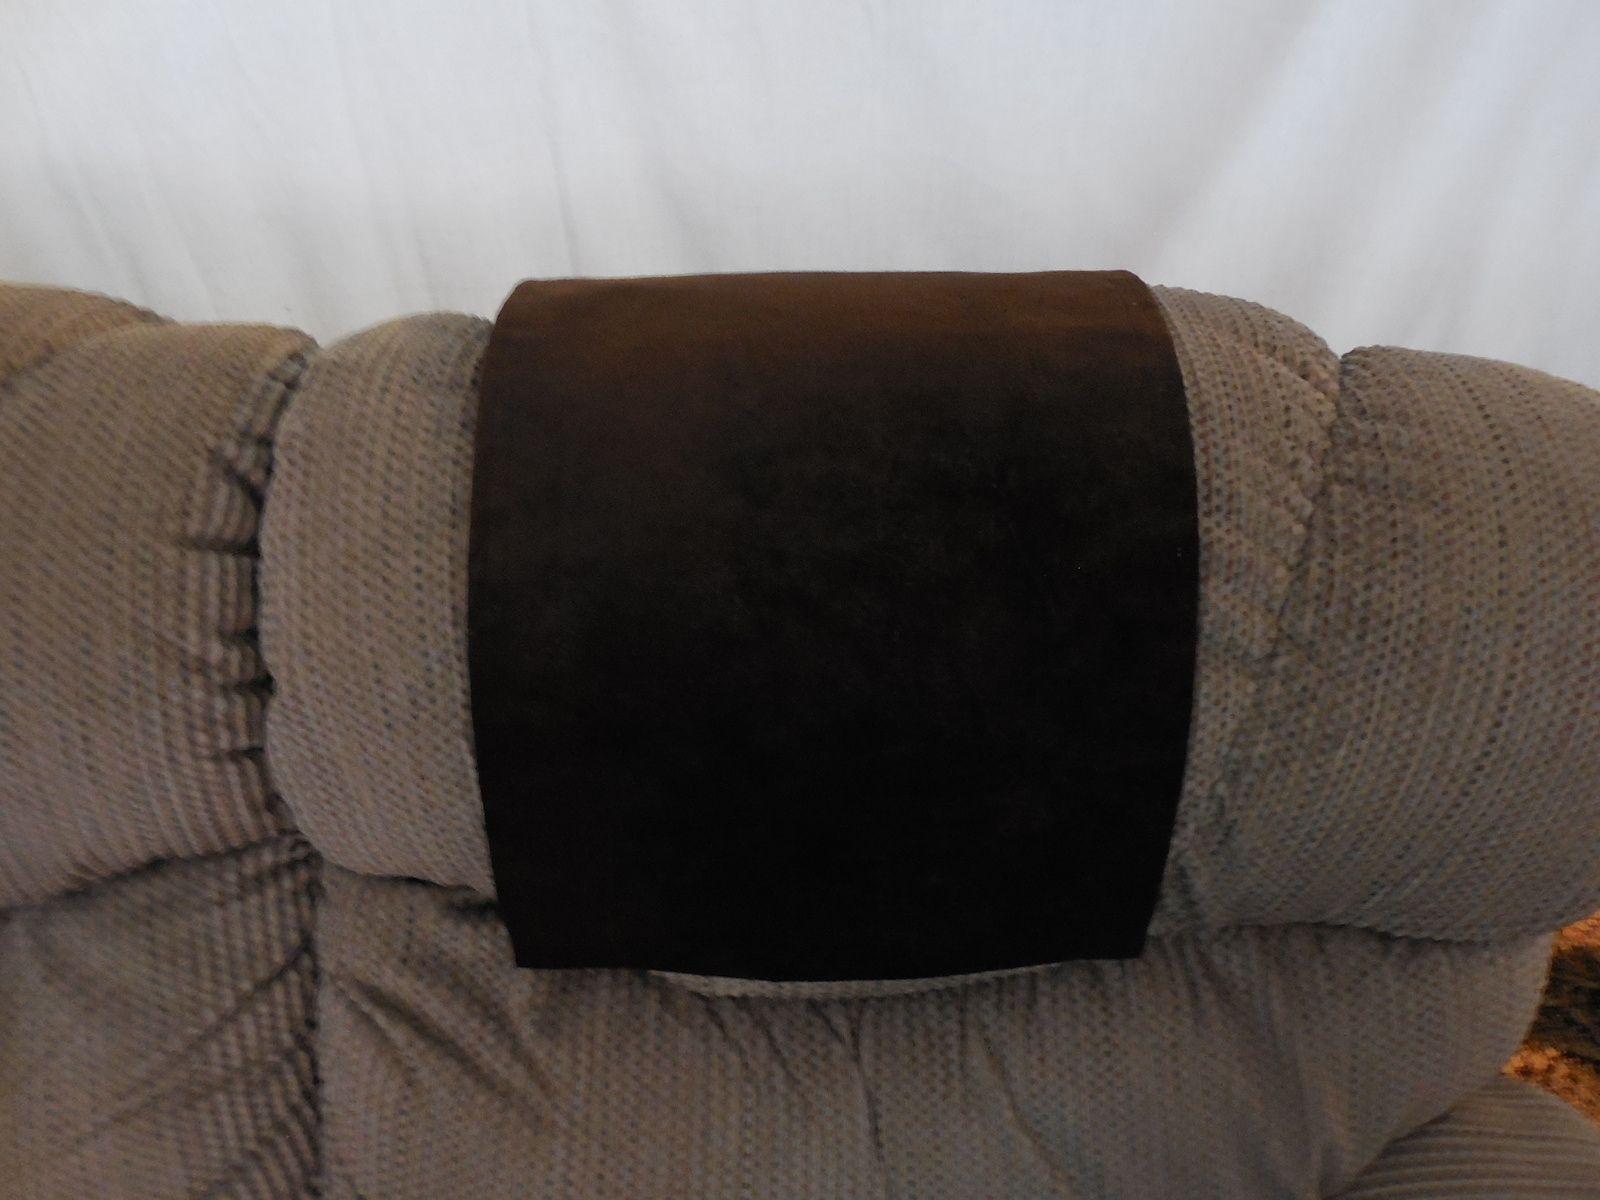 Chair Headrest Cover Kovi Dk Brown Upholstery Material